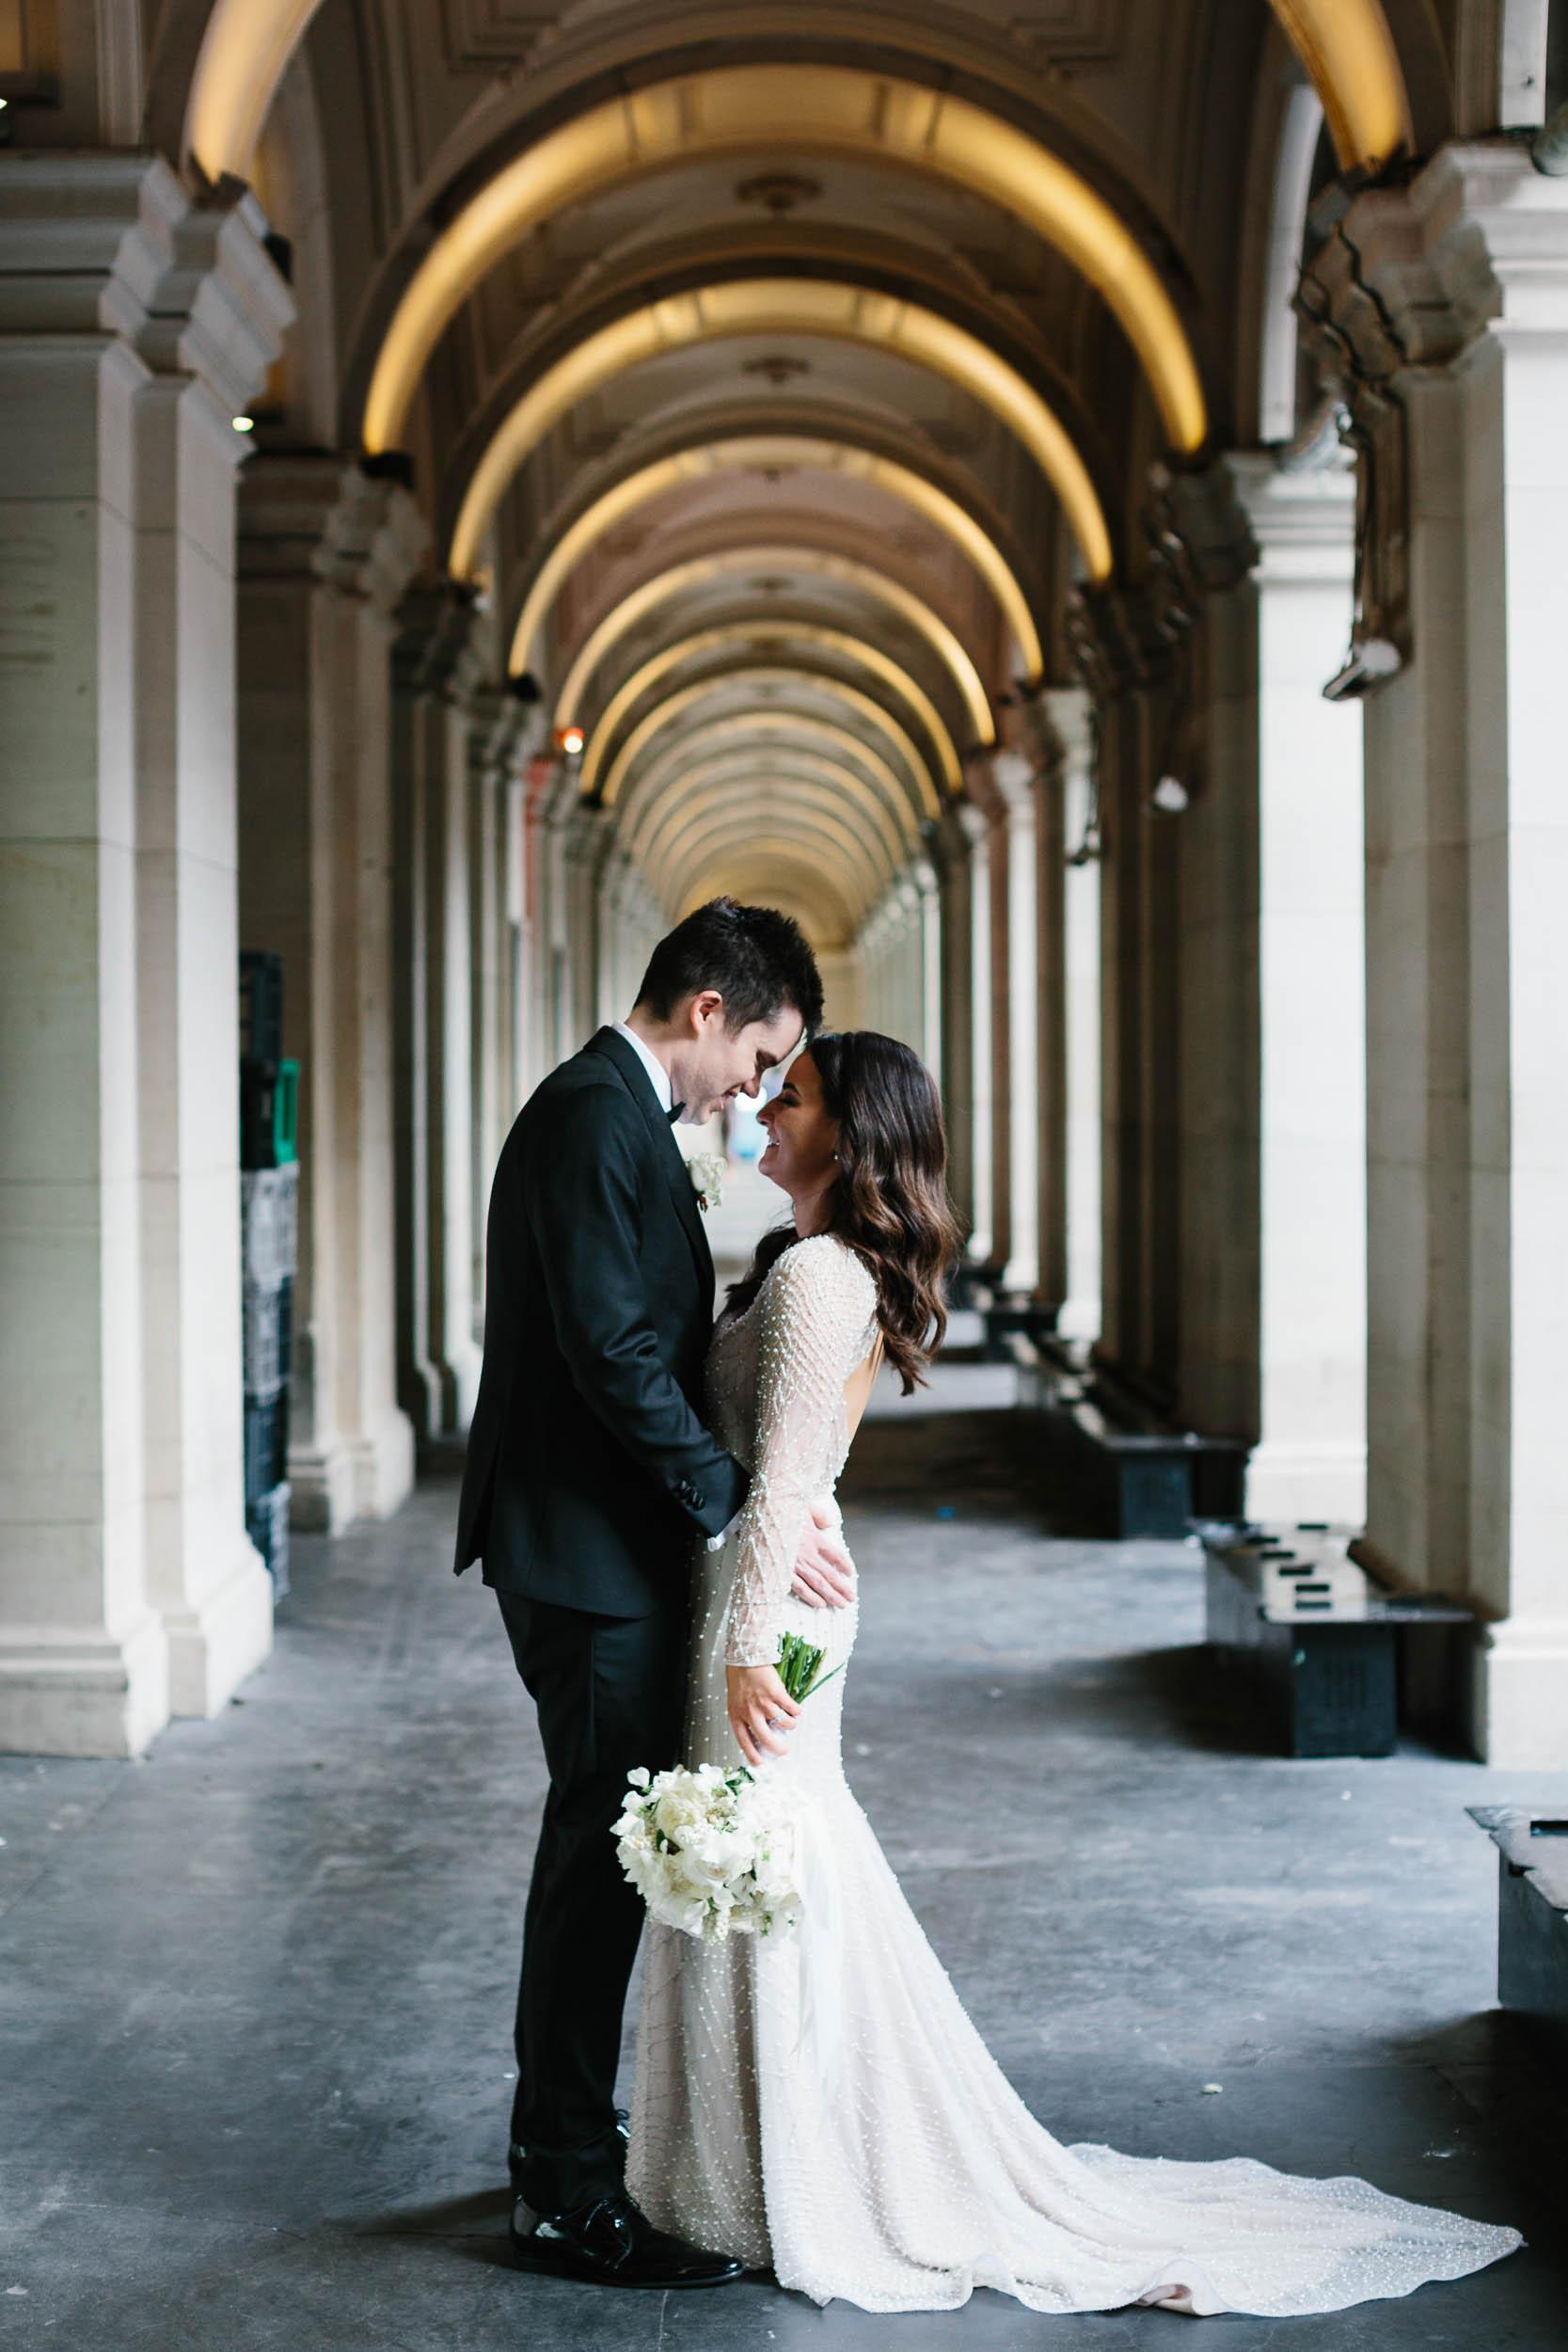 Kas-Richards-Wedding-Photographer-Melbourne-City-Wedding-Alto-Event-Space-Jane-Hill-Bridal-Gown-50.jpg